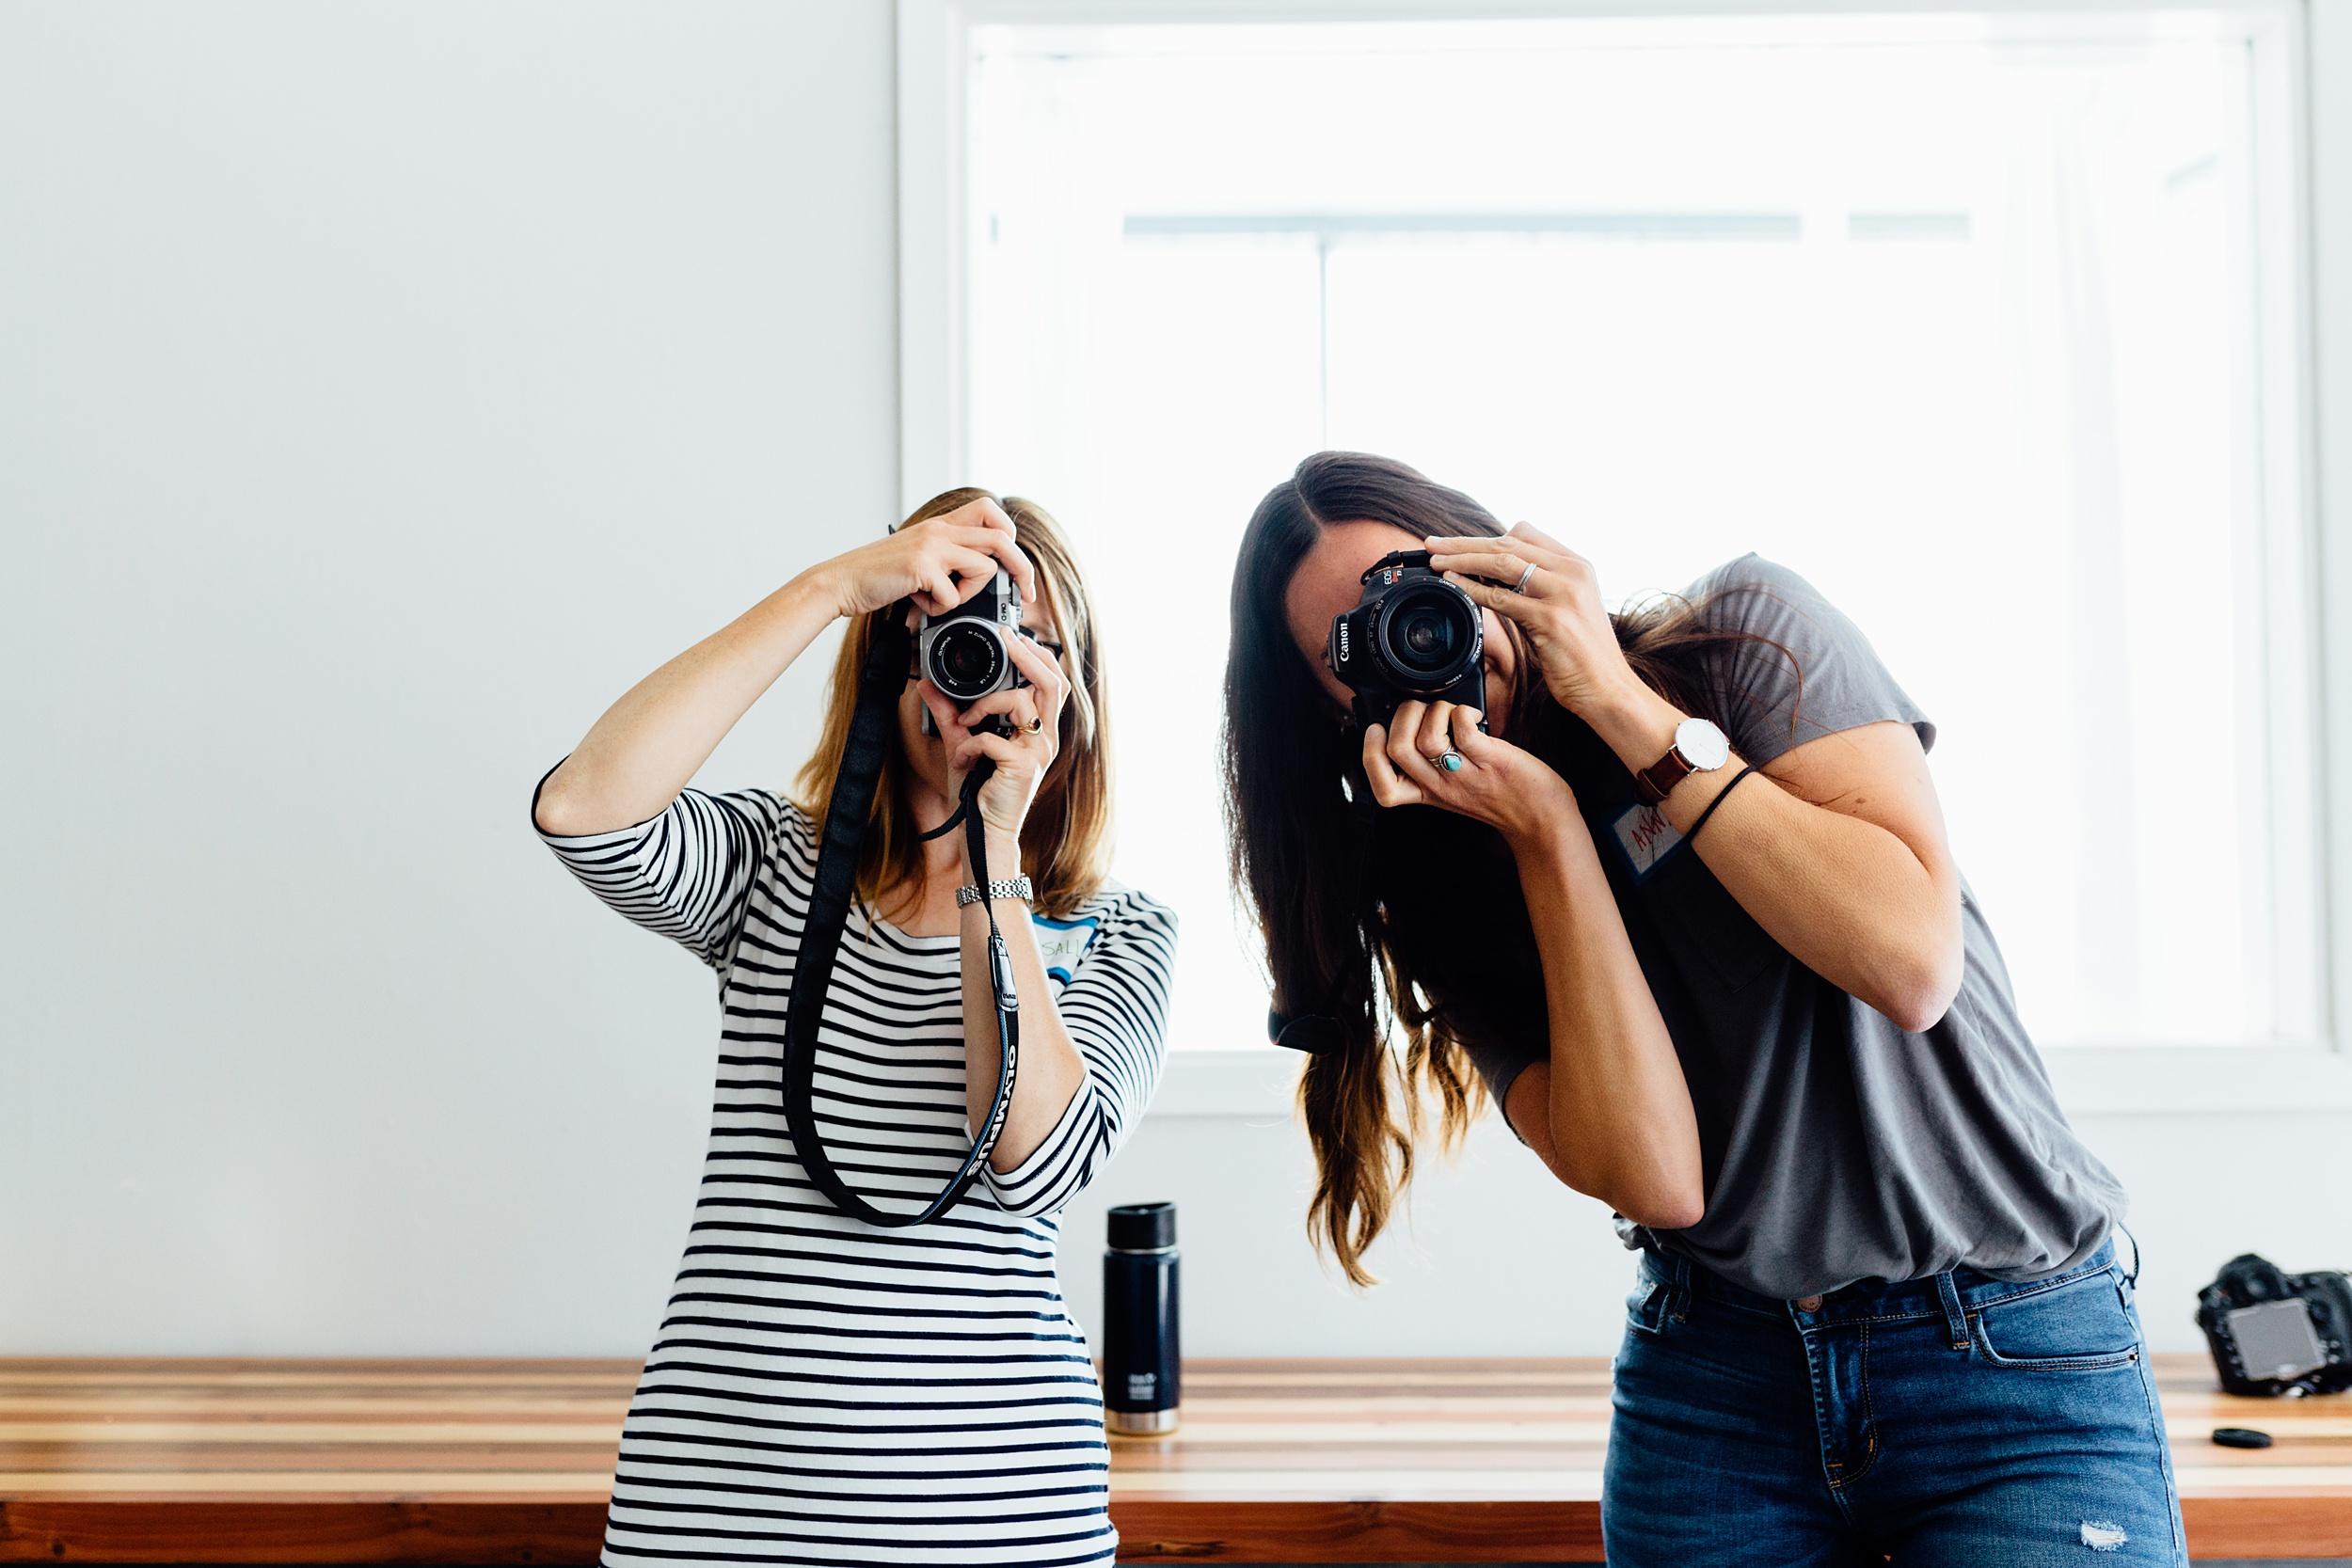 Icarian_Photography-bay-area-berkeley-east-bay-san-francisco-oakland-alameda-documentary-photographer-workshops-beginning-photography-workshop_0113.jpg